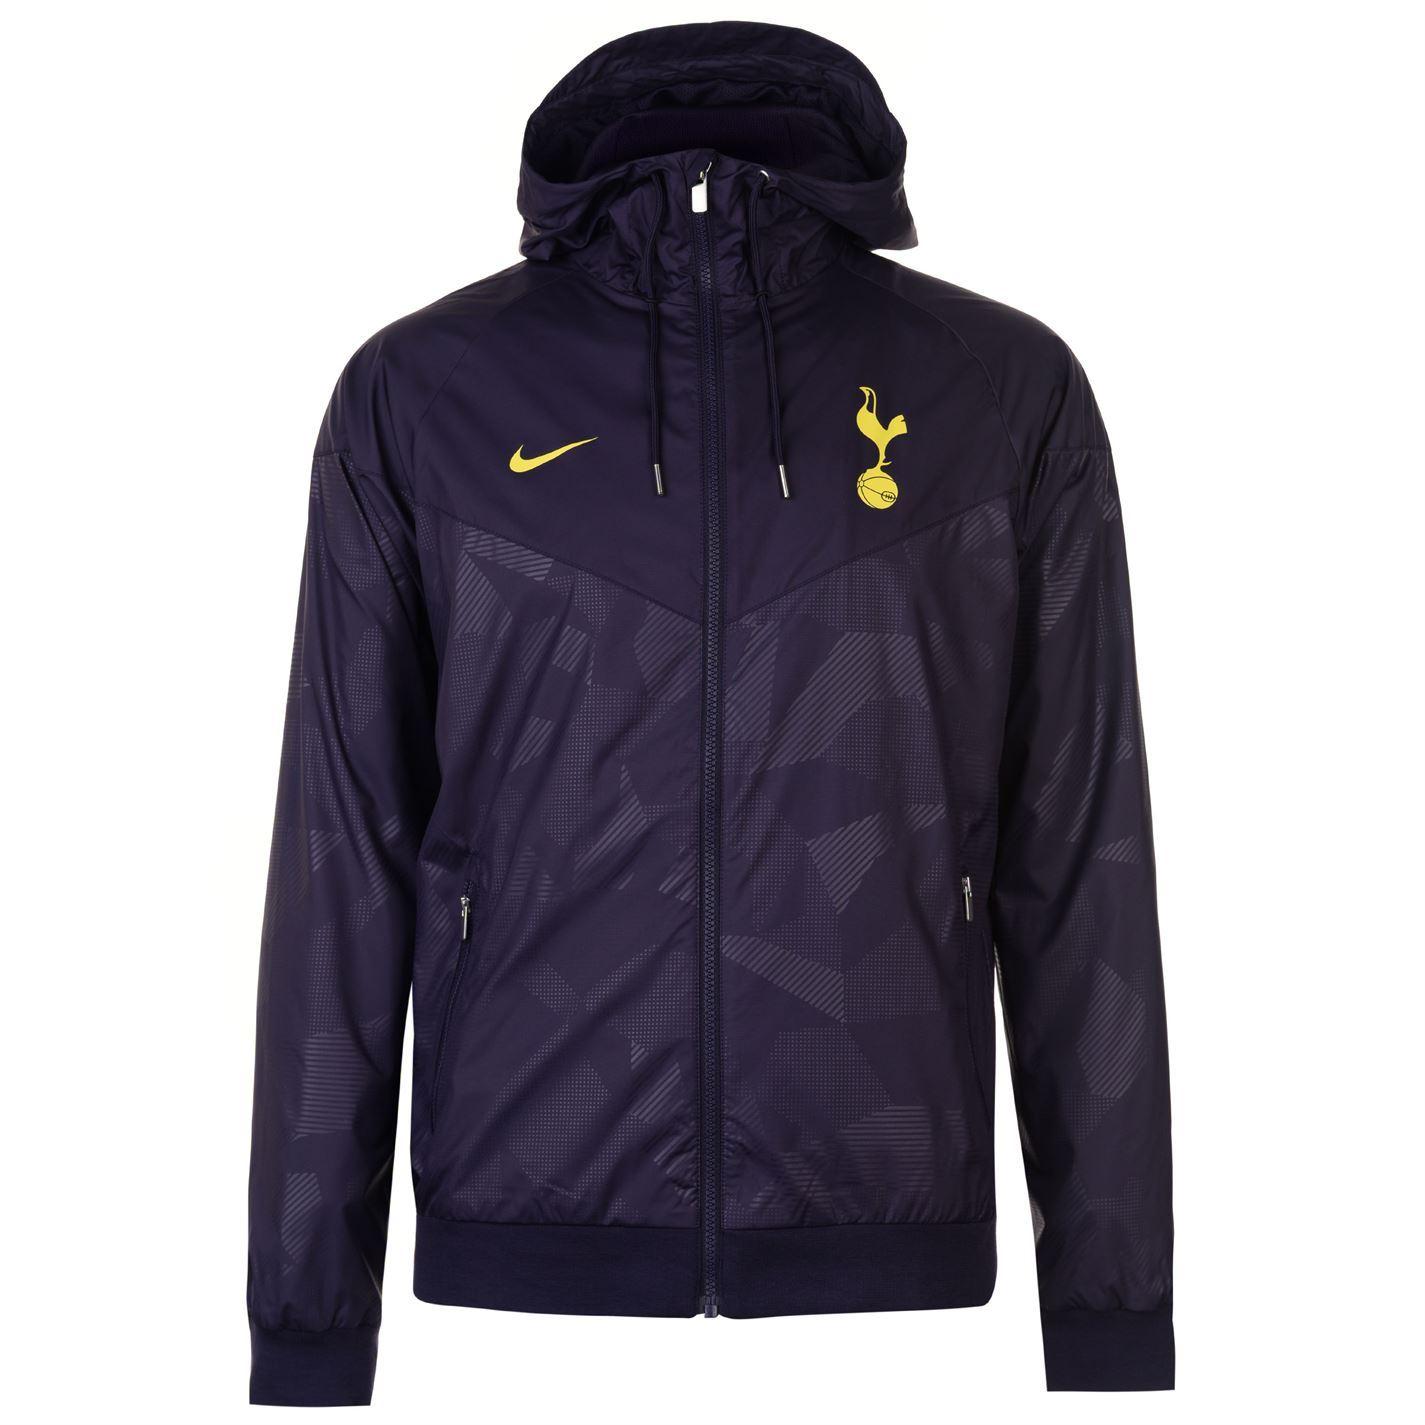 7d7f28c584 ... Nike Tottenham Hotspur Wind Runner Jacket Mens Purple Yellow Football  Soccer Top ...